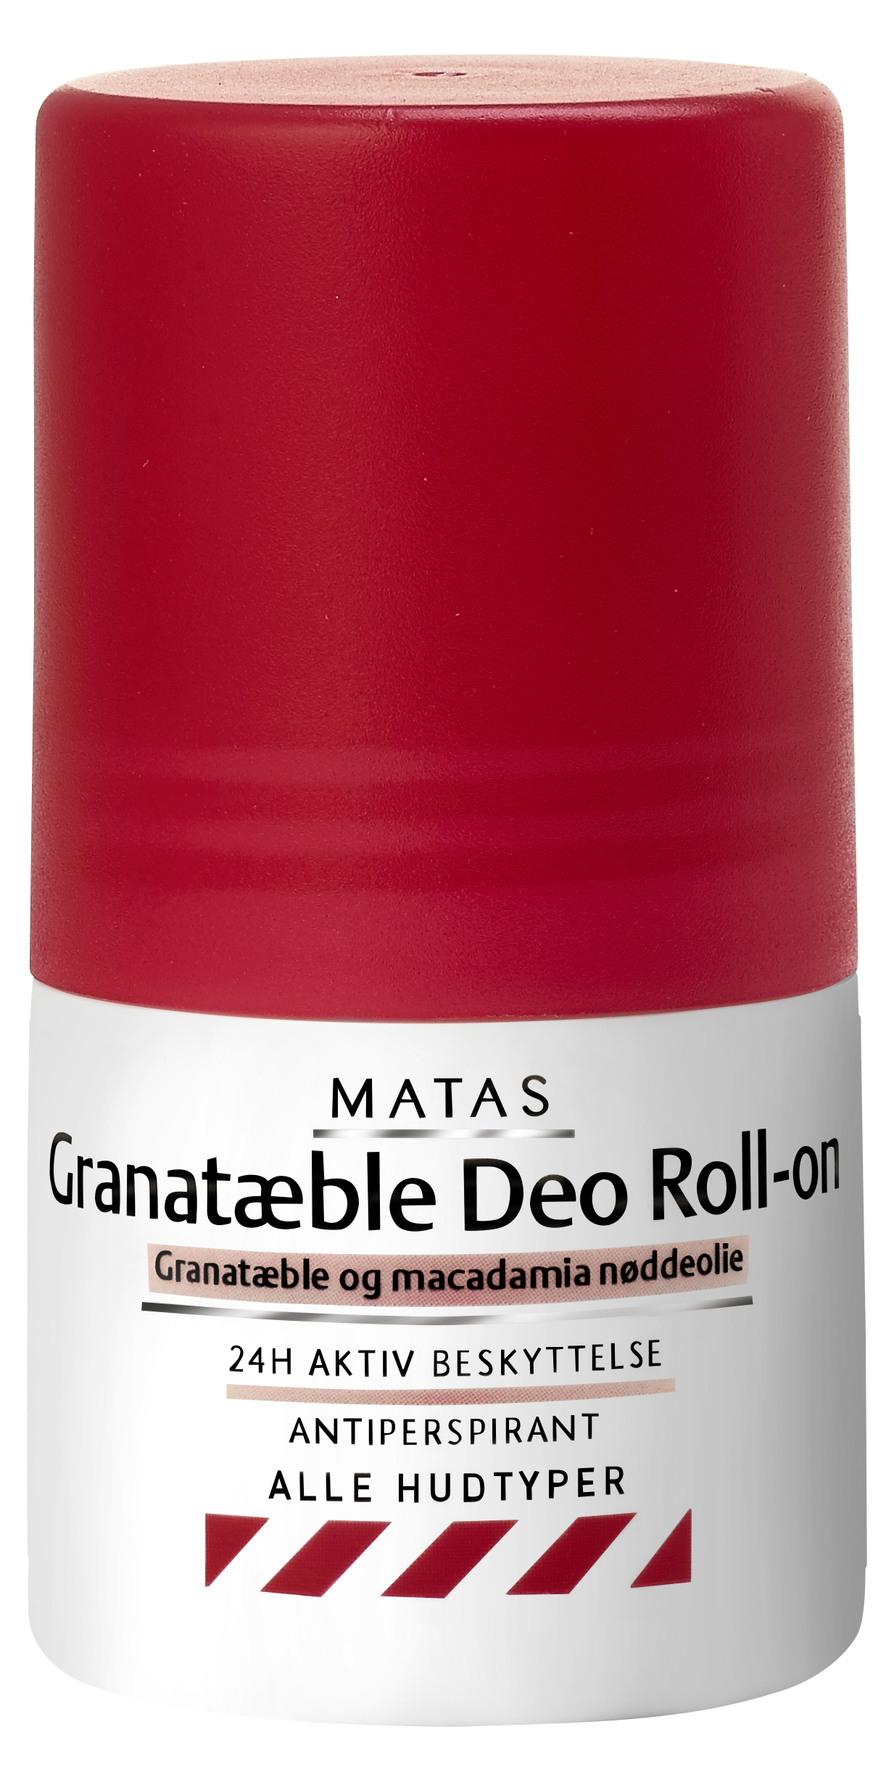 Matas Granatæble Deo Roll-on 30 ml